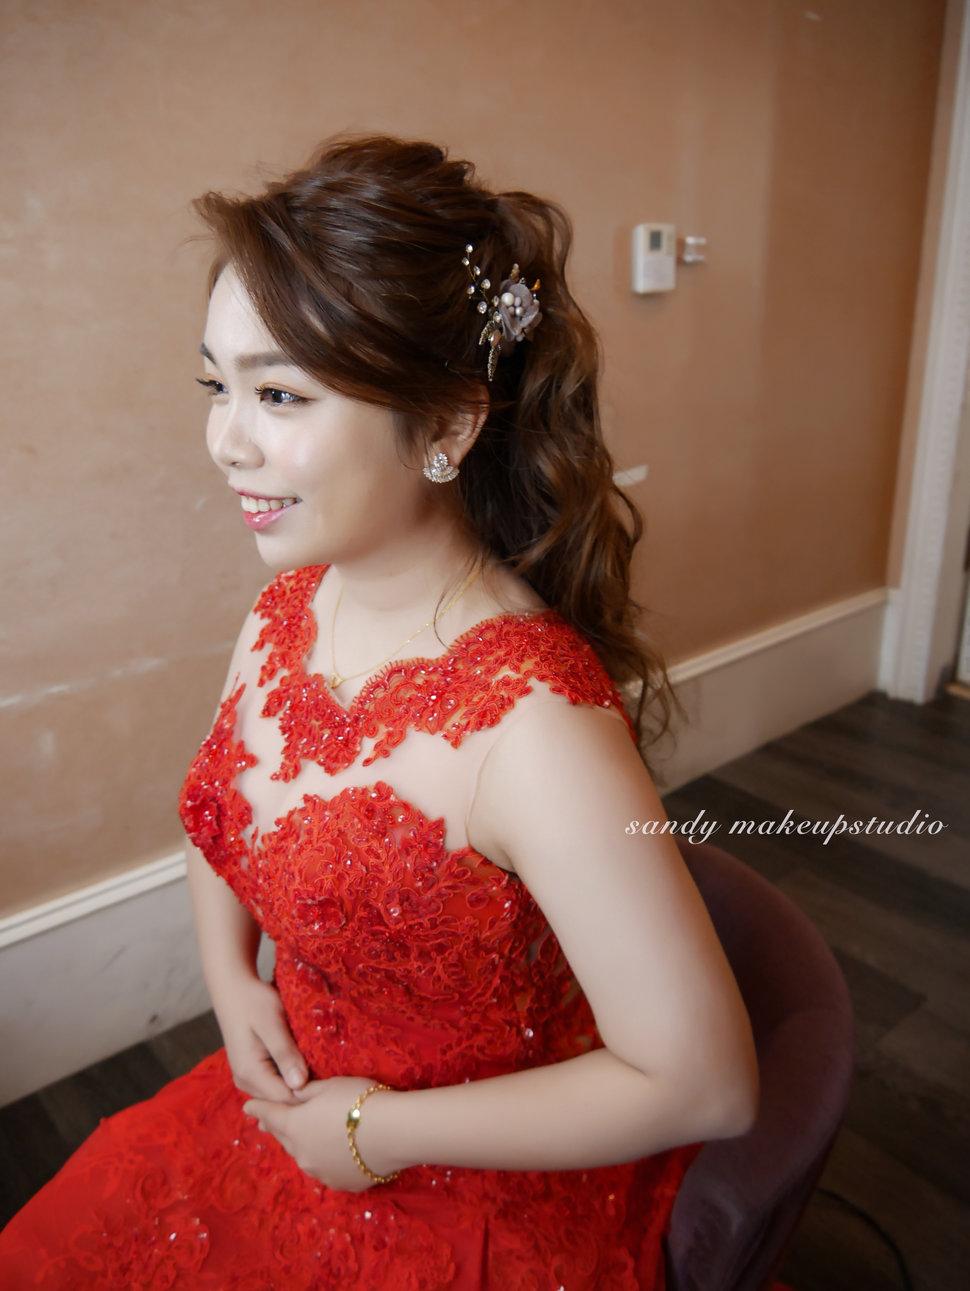 P1120154拷貝 - 基隆台北全省Sandy新娘秘書《結婚吧》